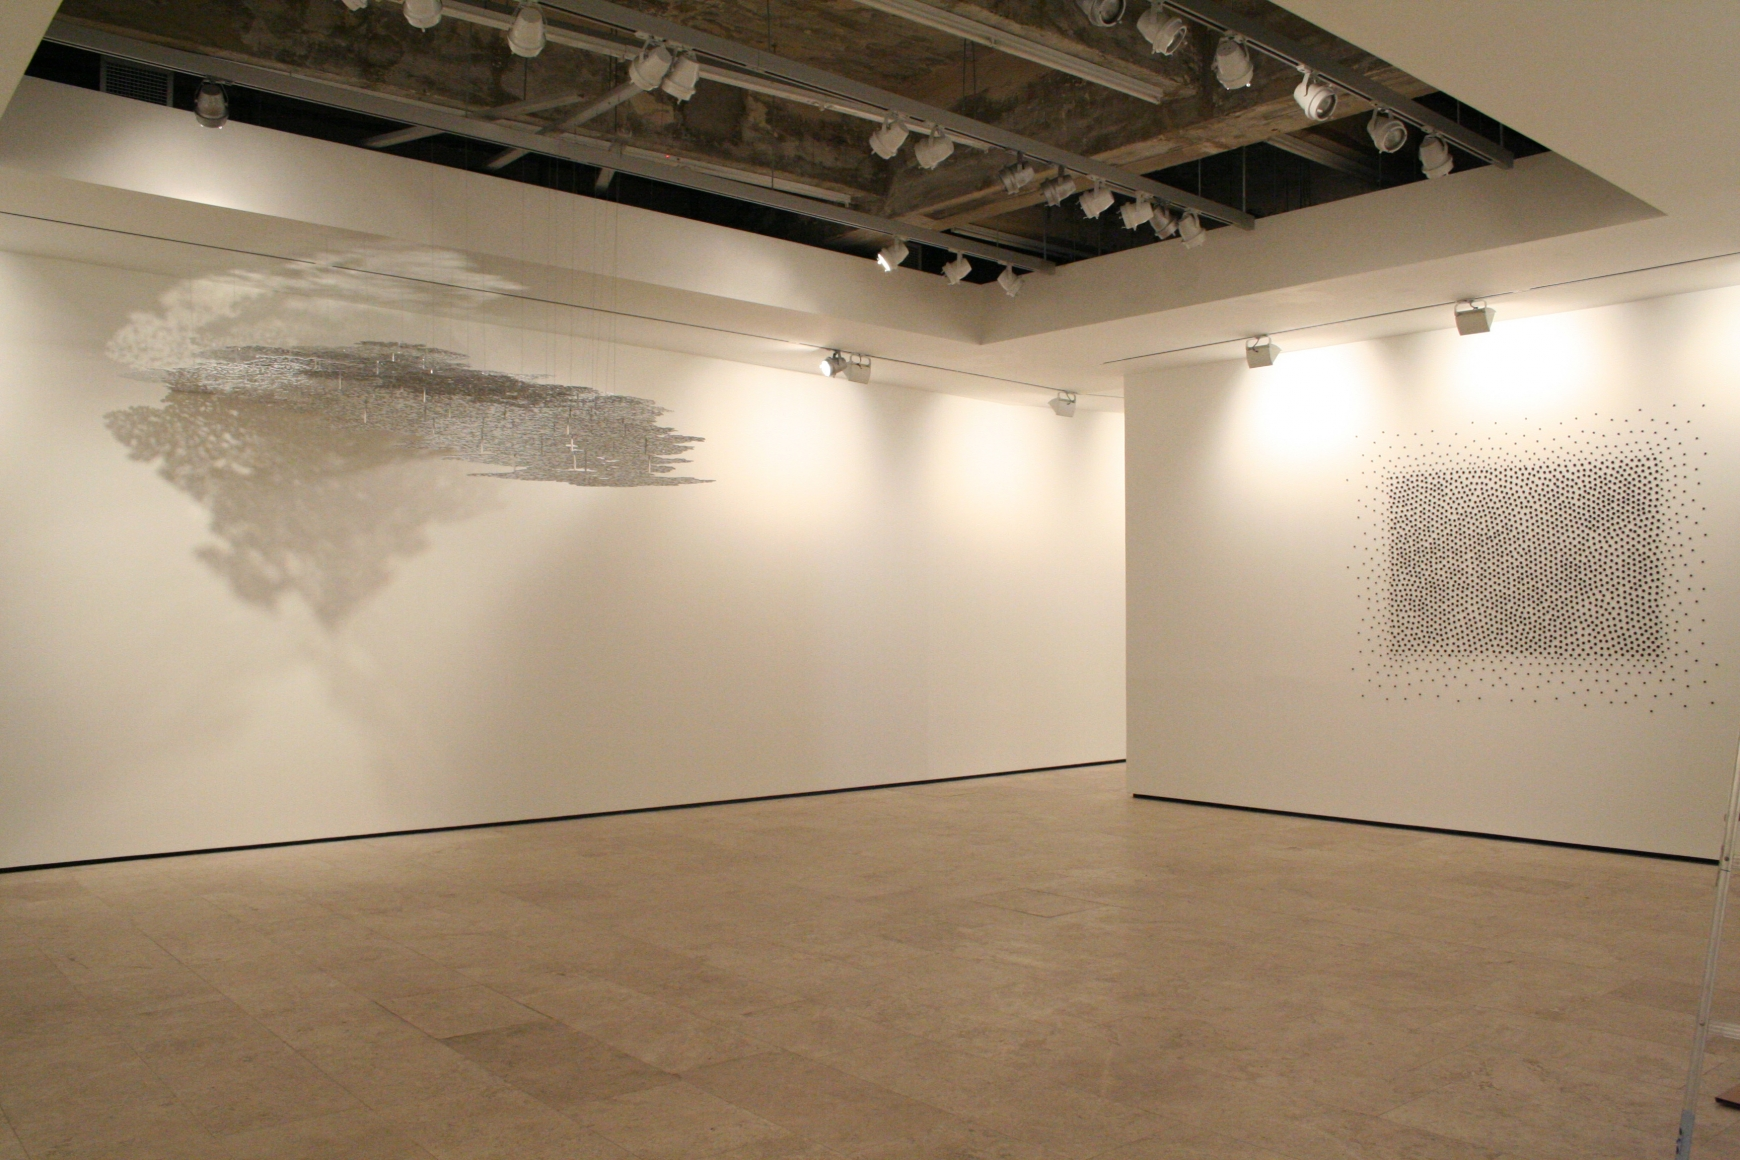 View 4 of TERESITA FERNANDEZ Installation at Lehmann Maupin Gallery.